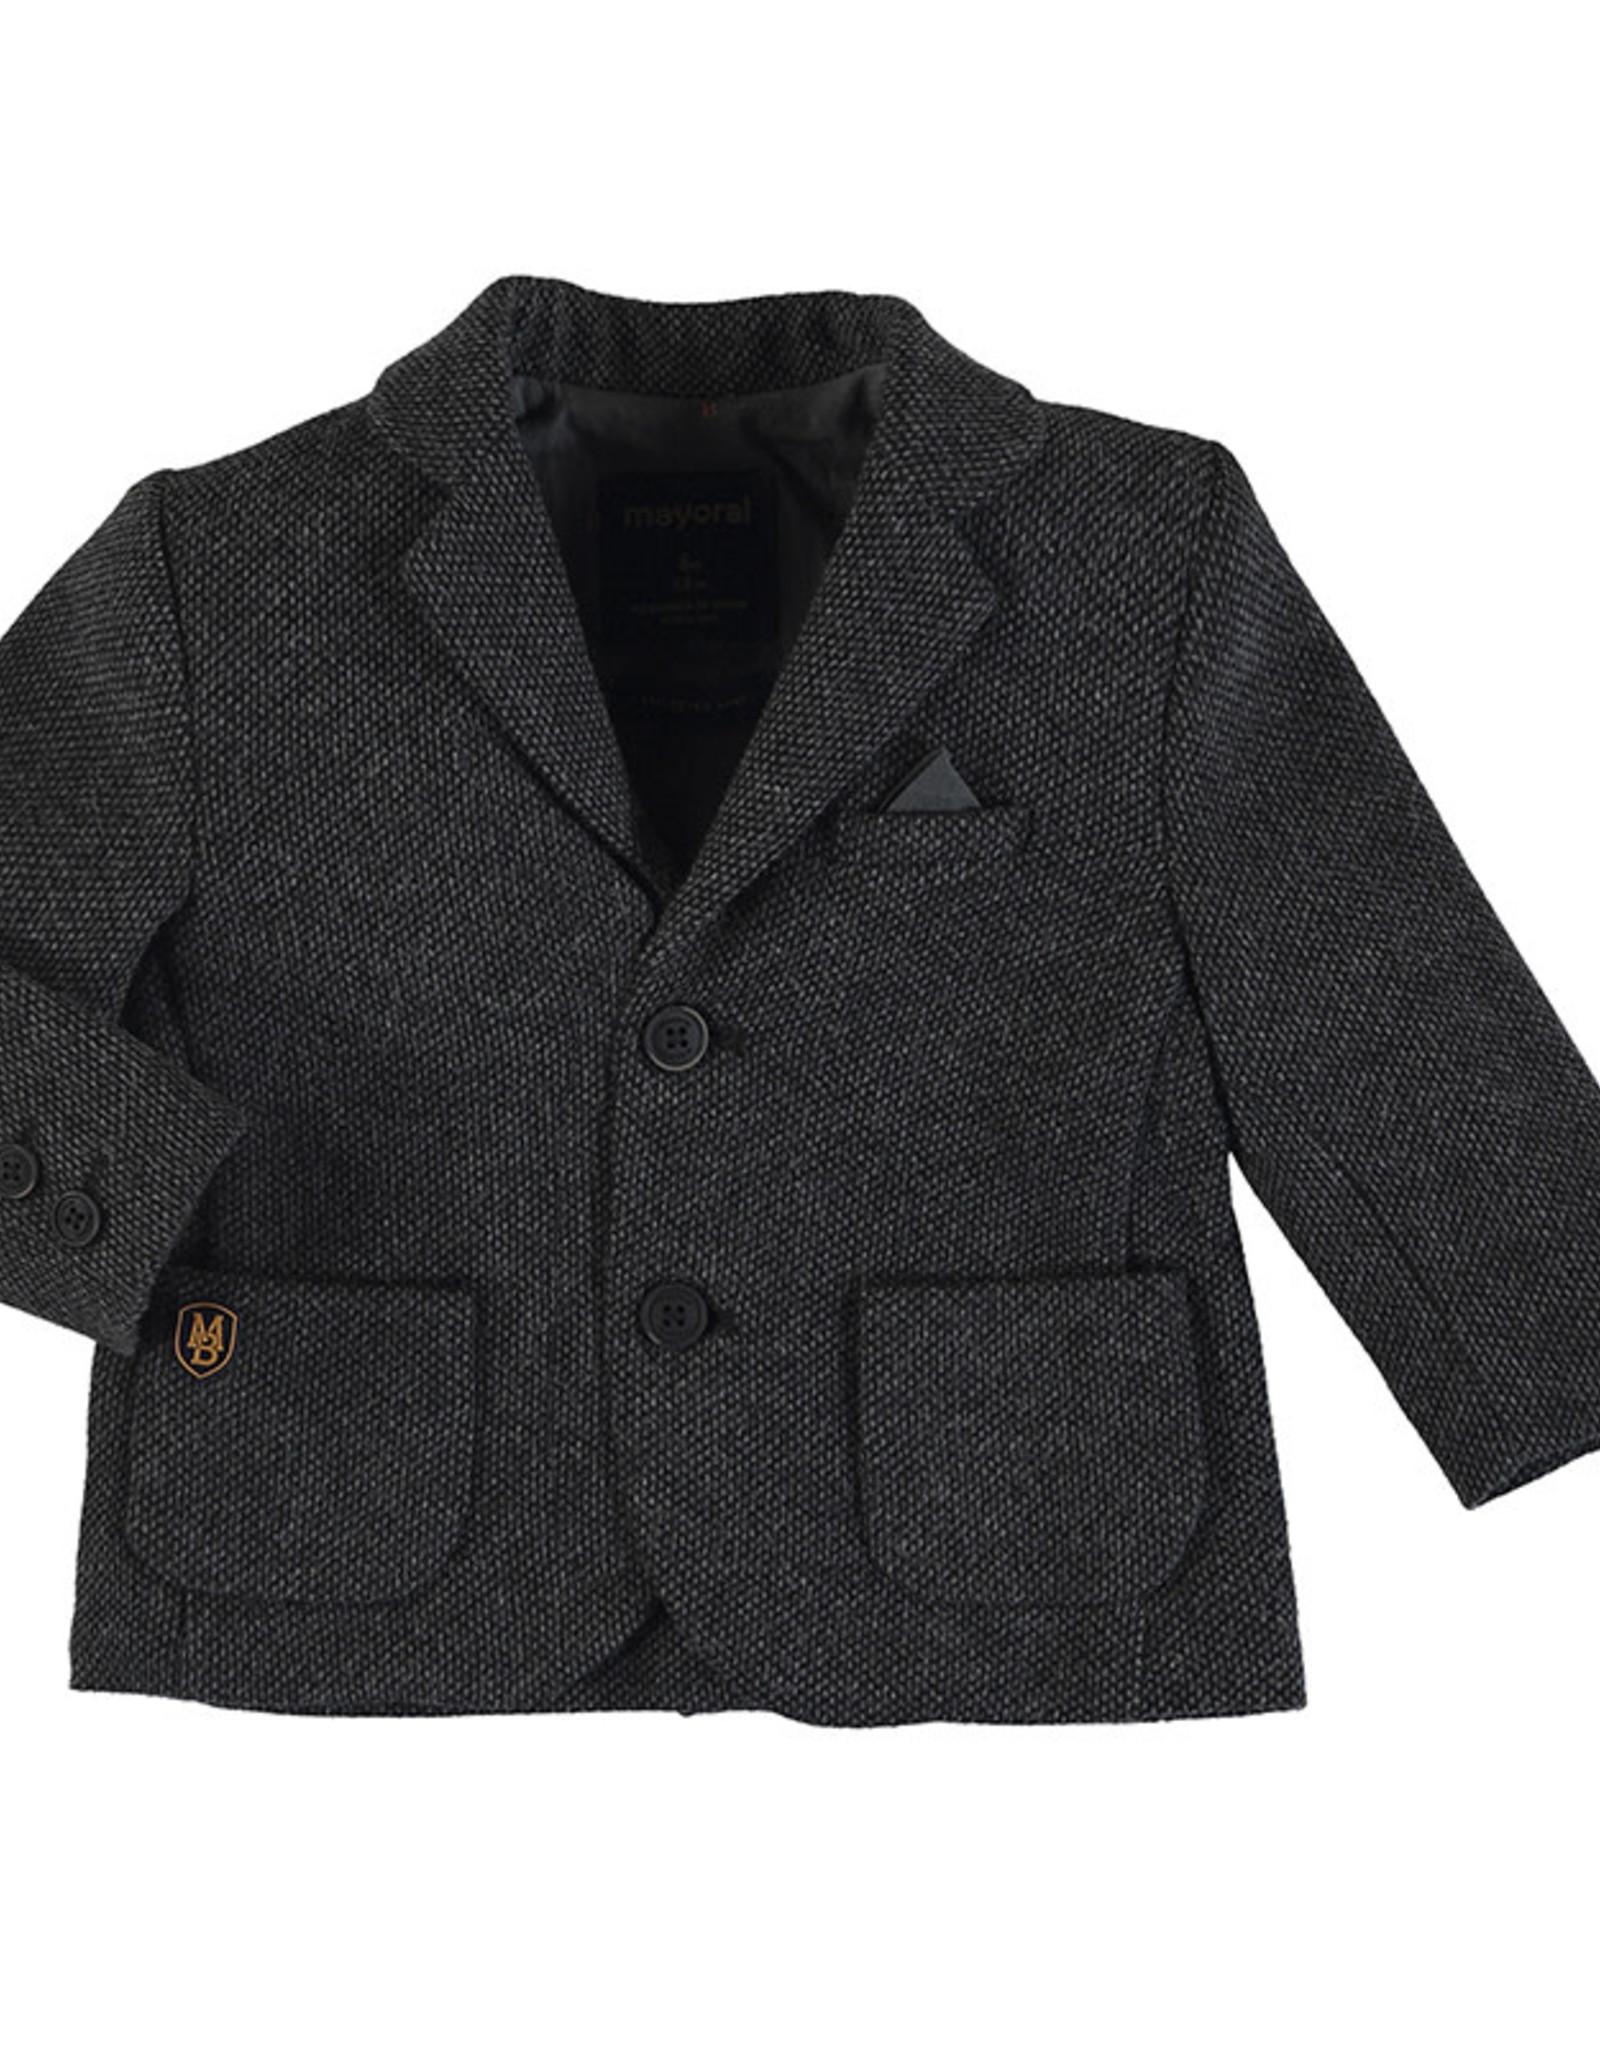 Mayoral Infant Boys Charcoal Tweed Blazer